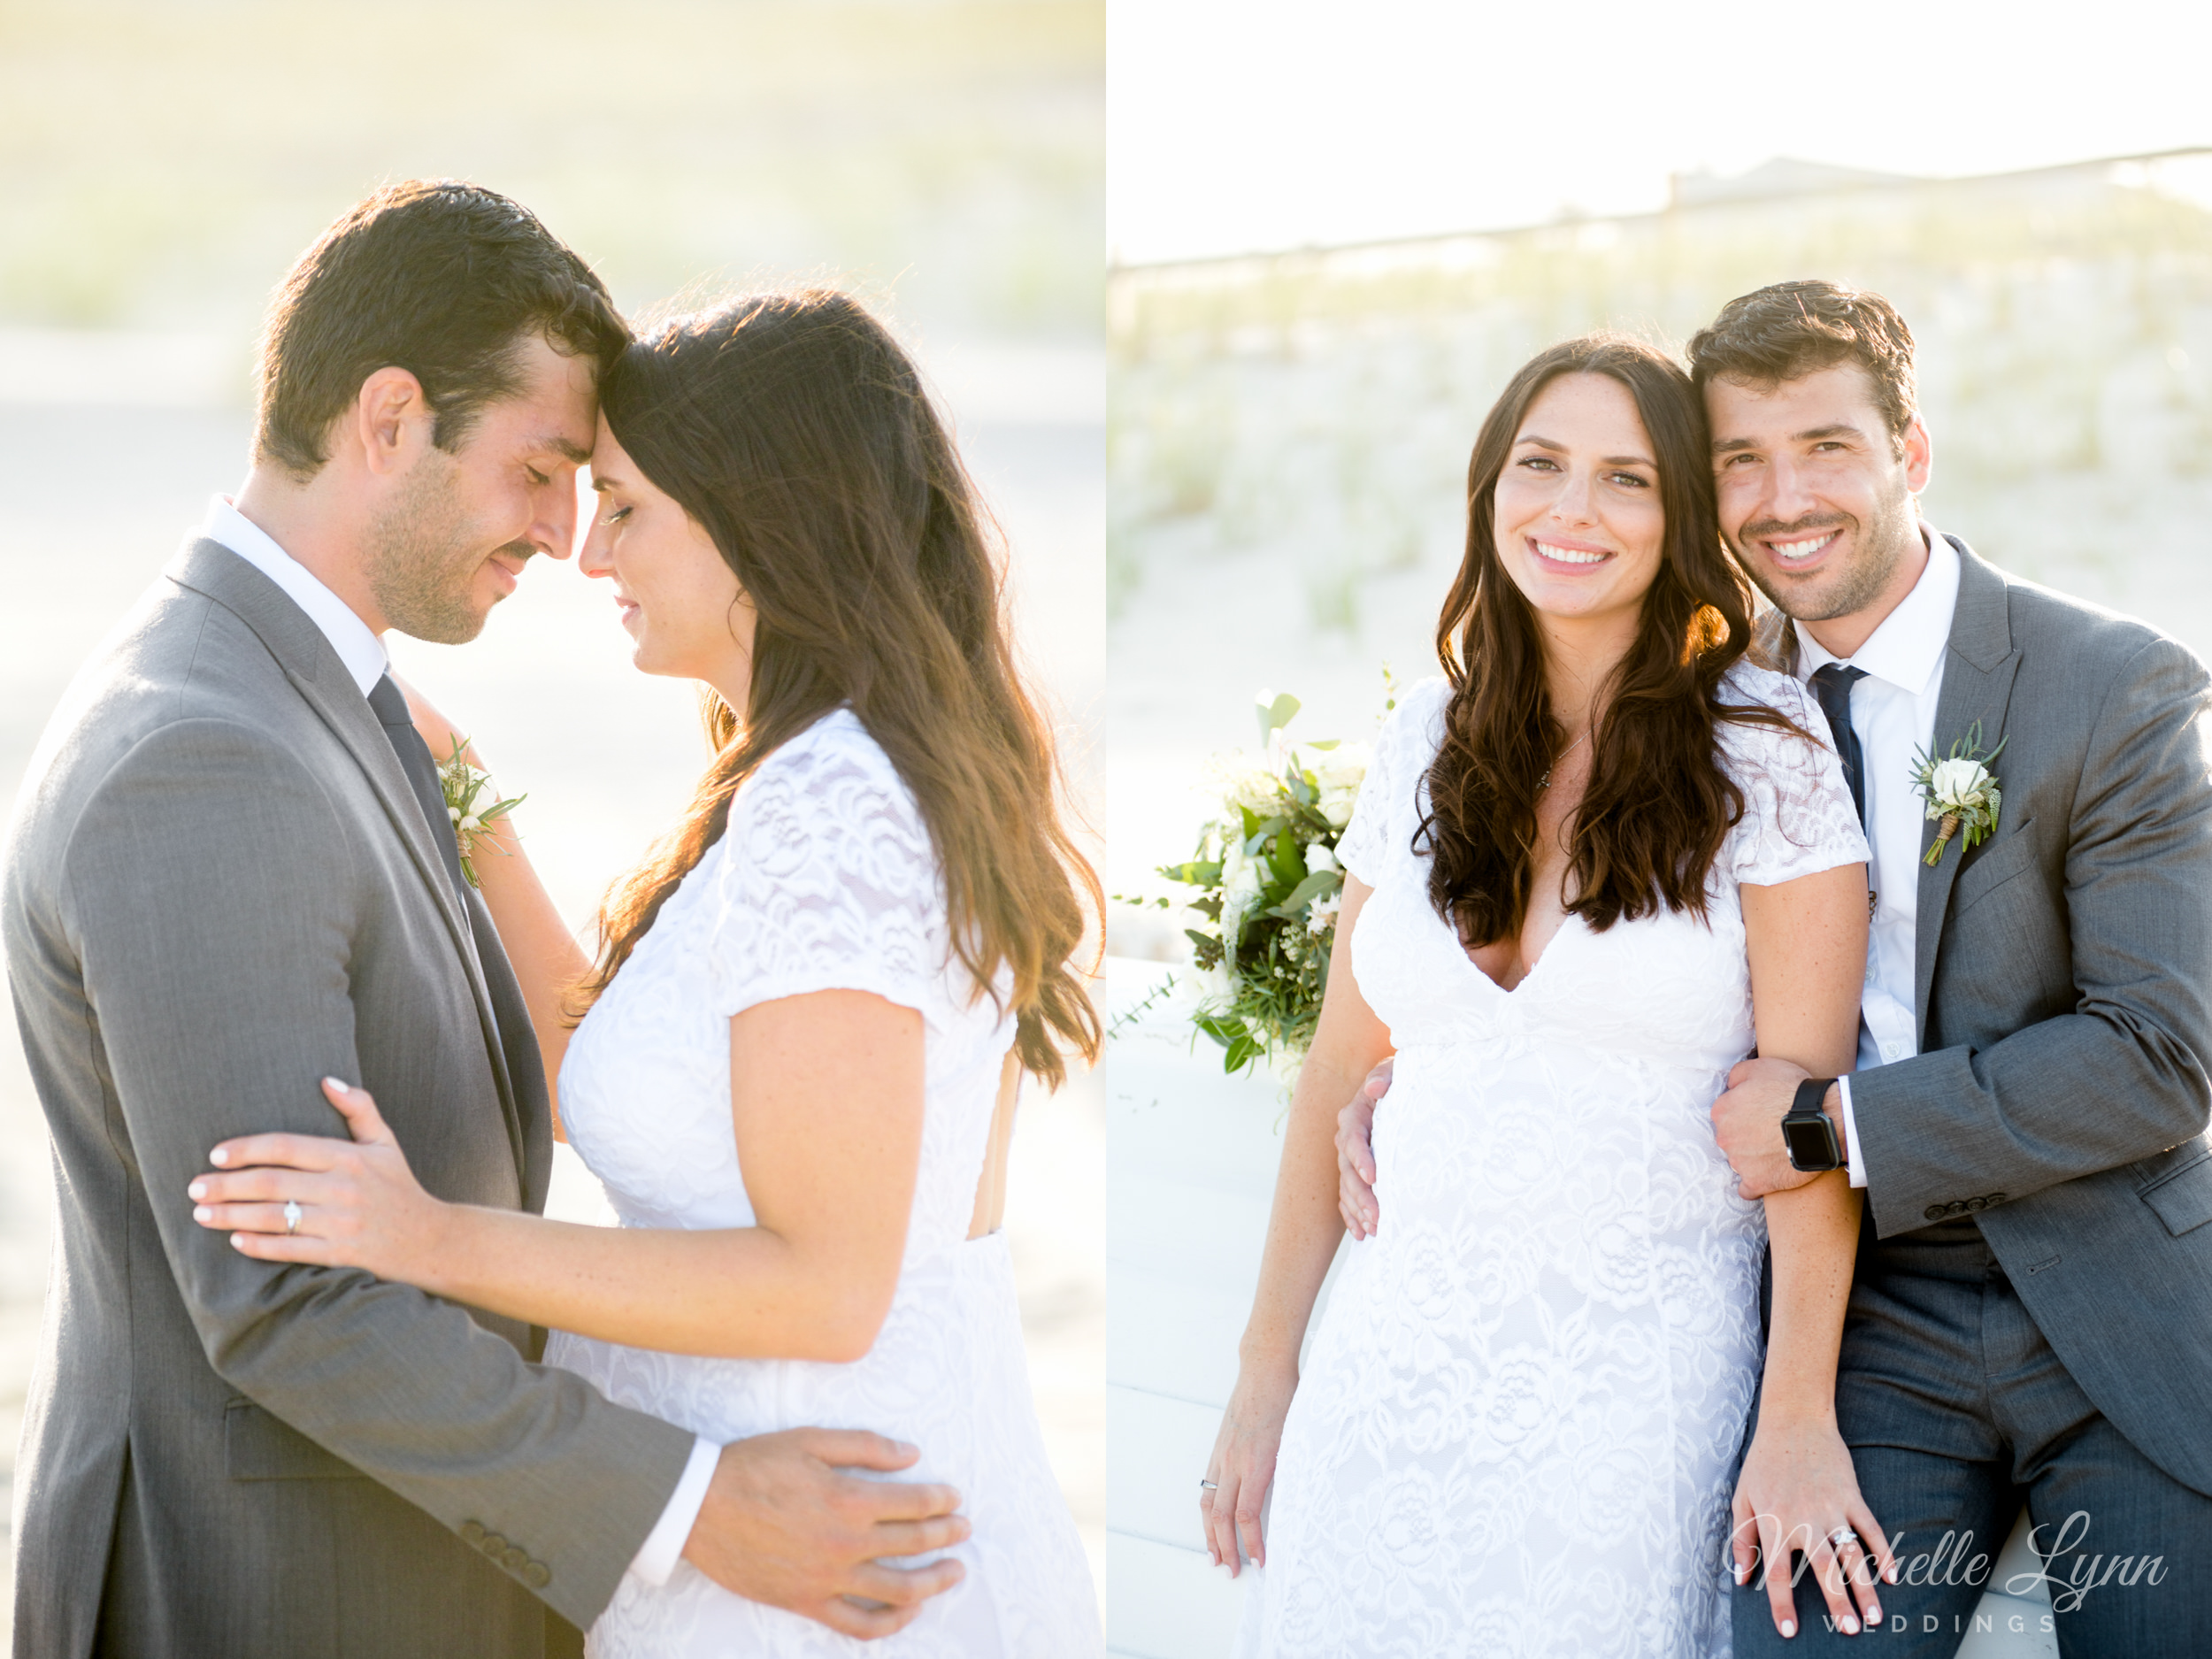 mlw-long-beach-island-new-jersey-wedding-photography-11.jpg